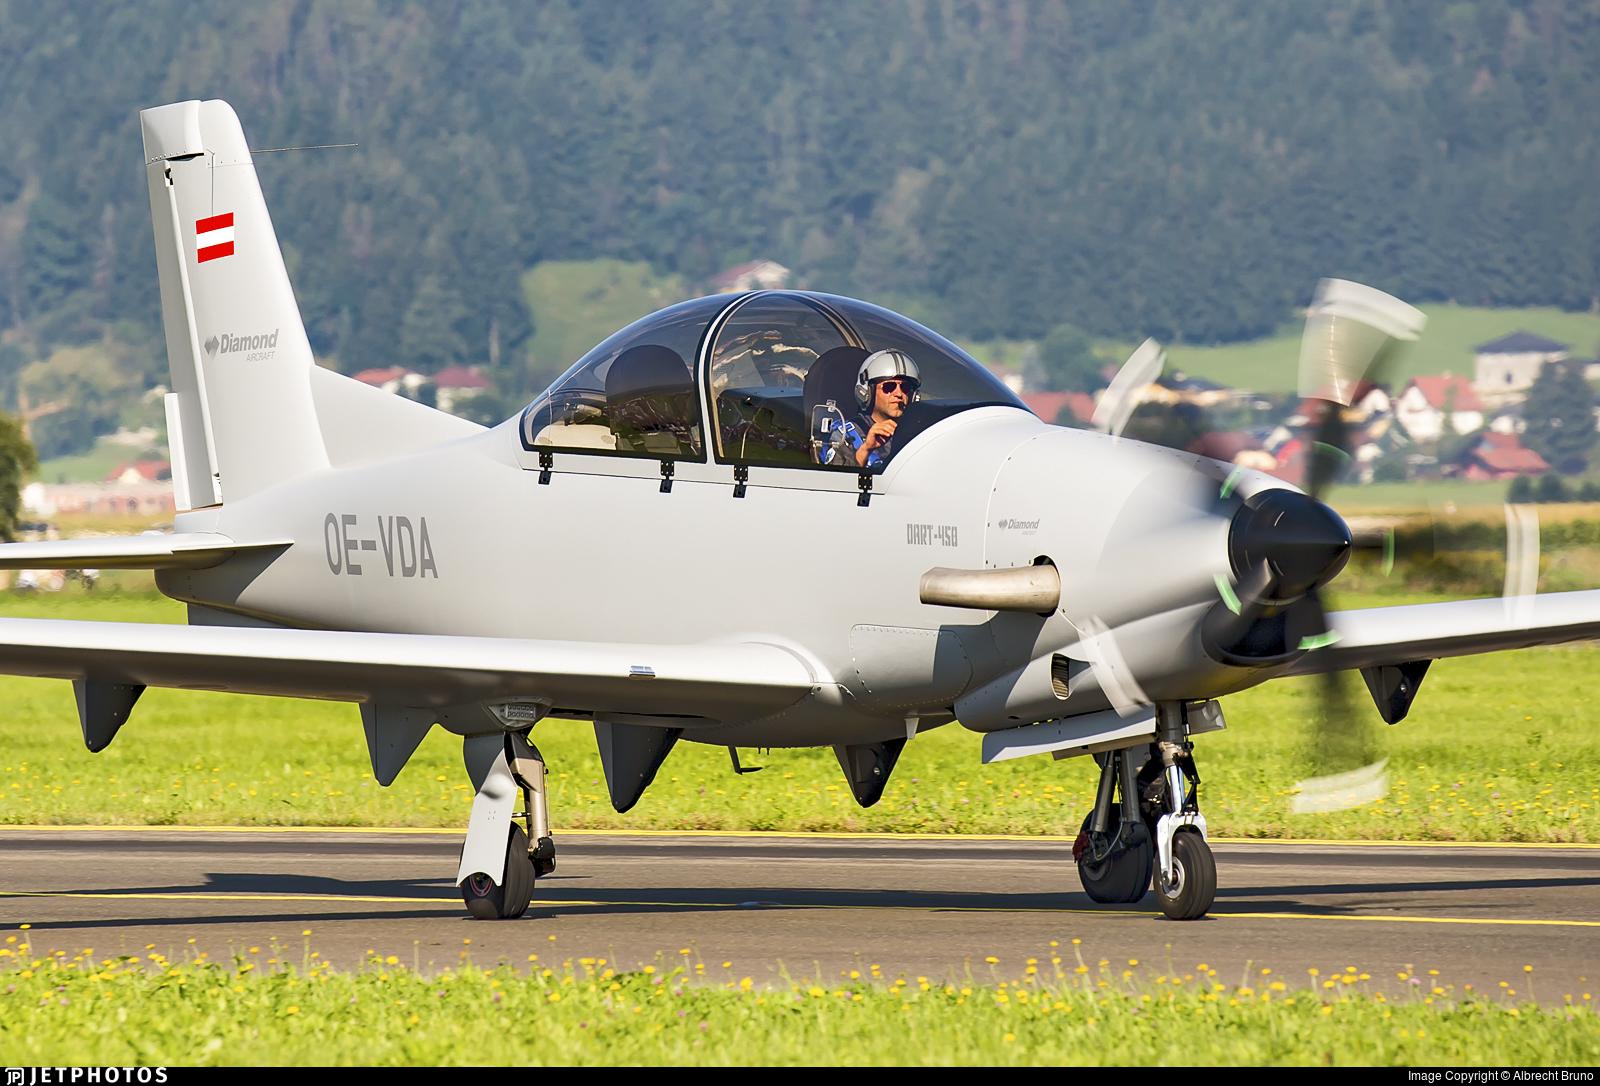 OE-VDA - Diamond Aircraft DART-450 - Diamond Aircraft Industries